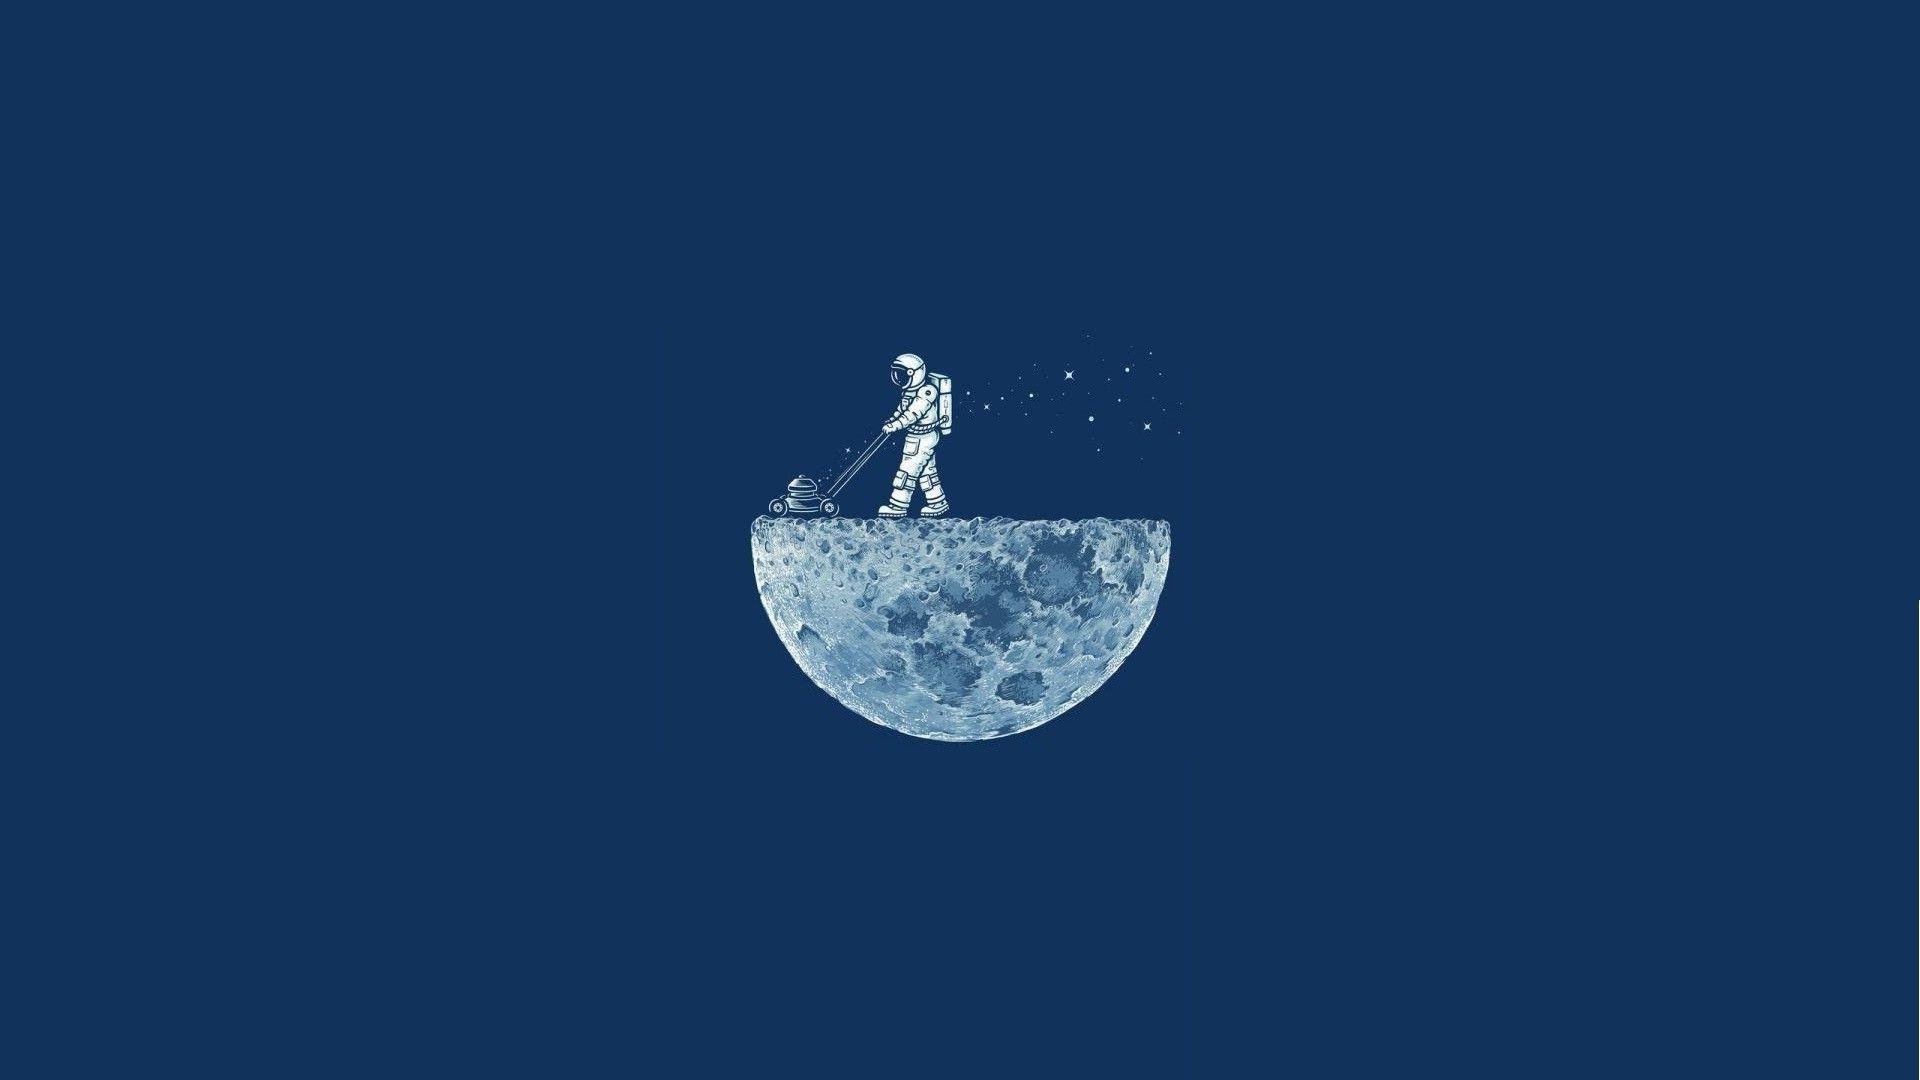 space, Minimalism, Blue Background, Moon, Astronaut